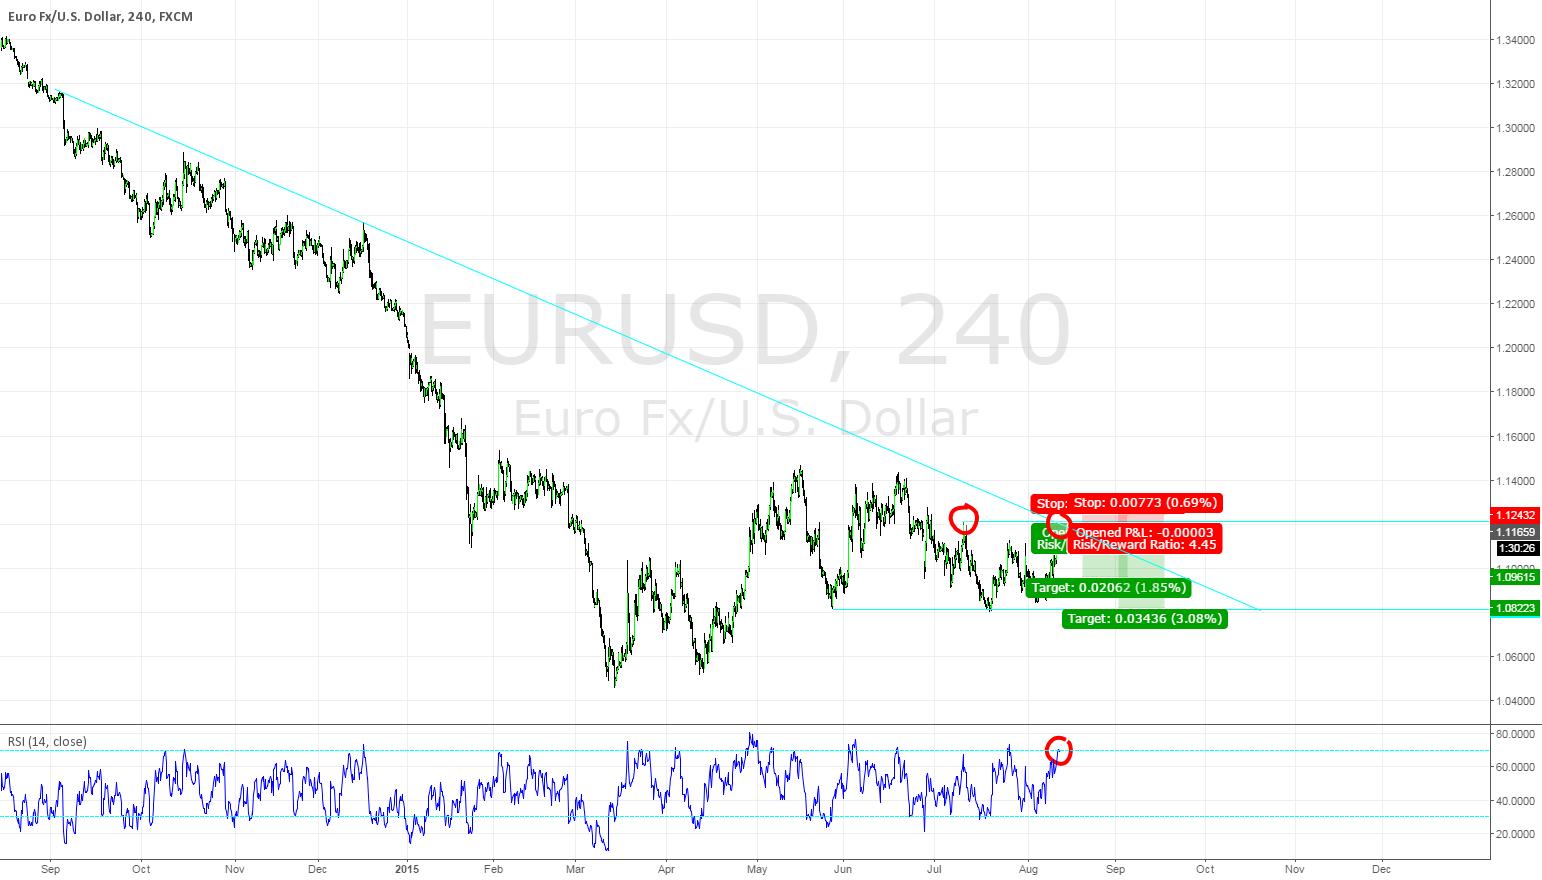 EURUSD Double Top Trend Continuation Trade